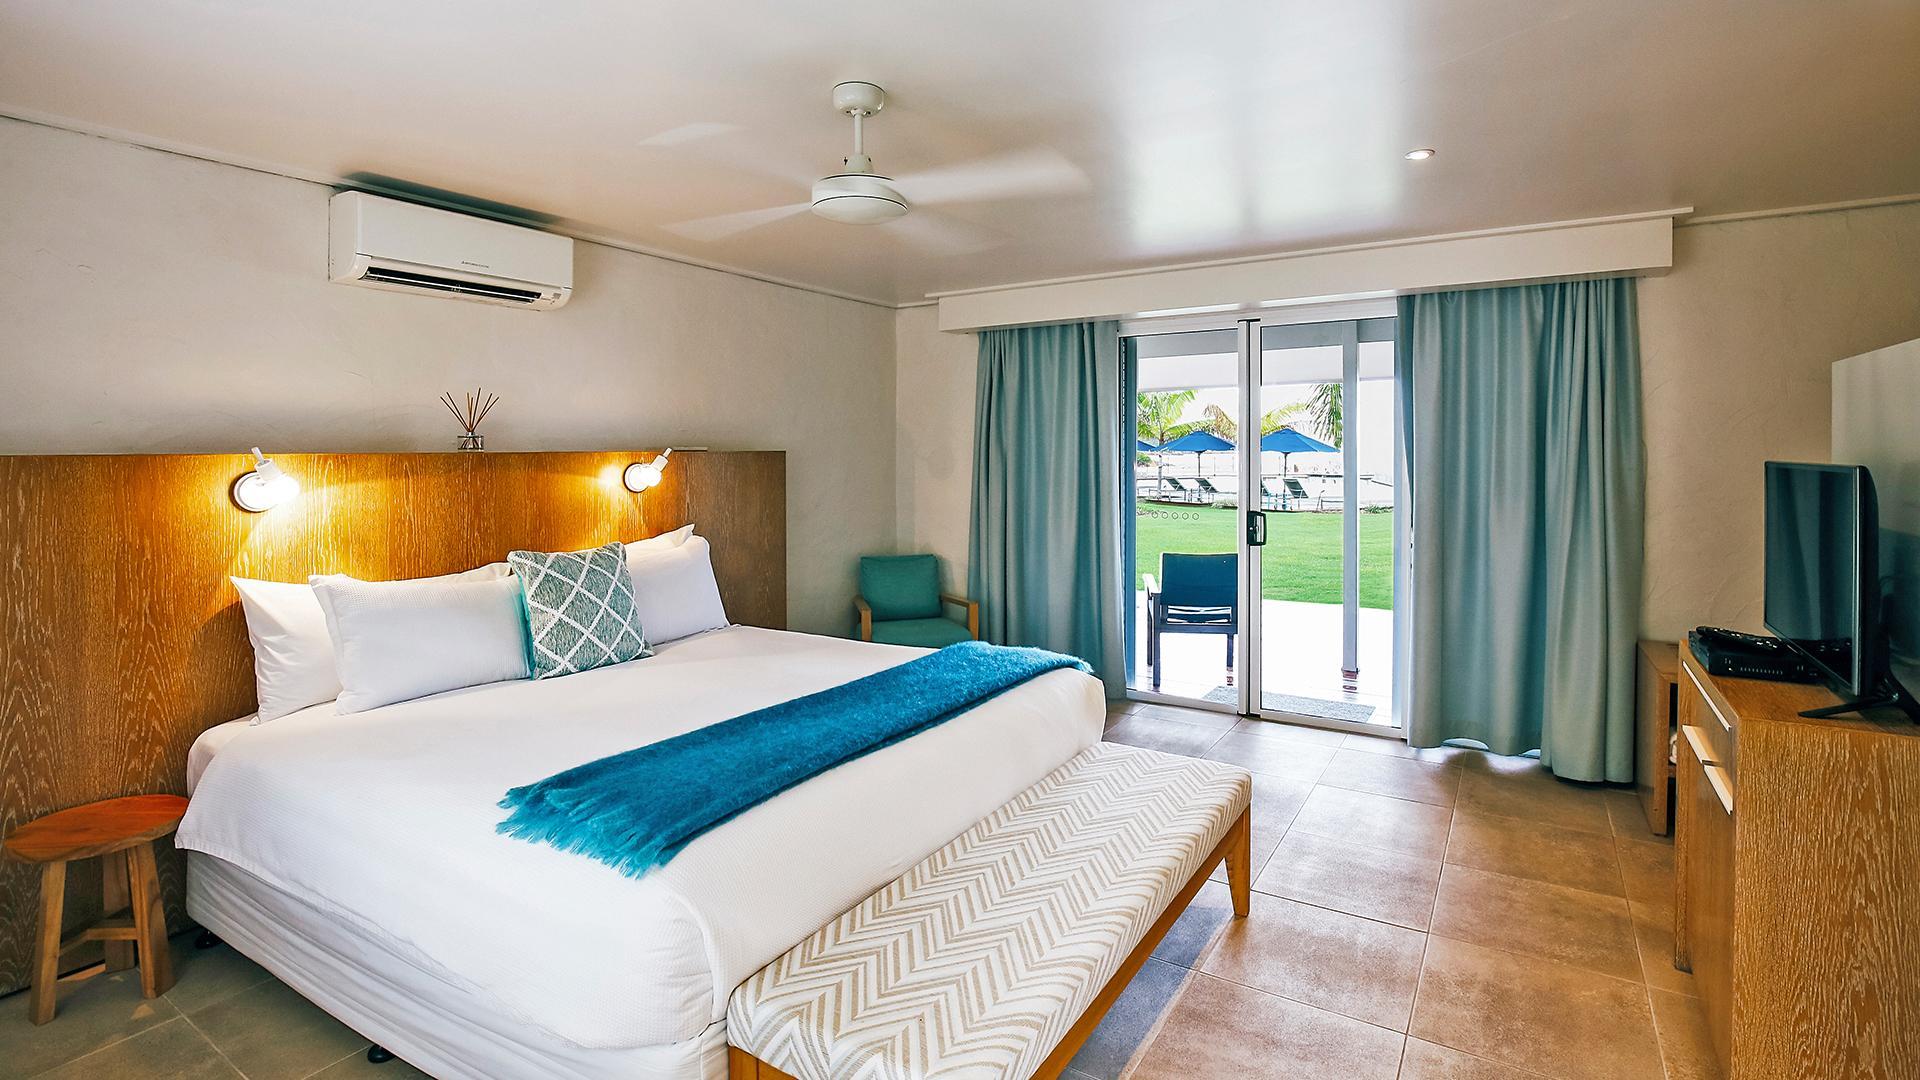 North Beachfront Room NOV2018 image 1 at Orpheus Island Lodge by null, Queensland, Australia